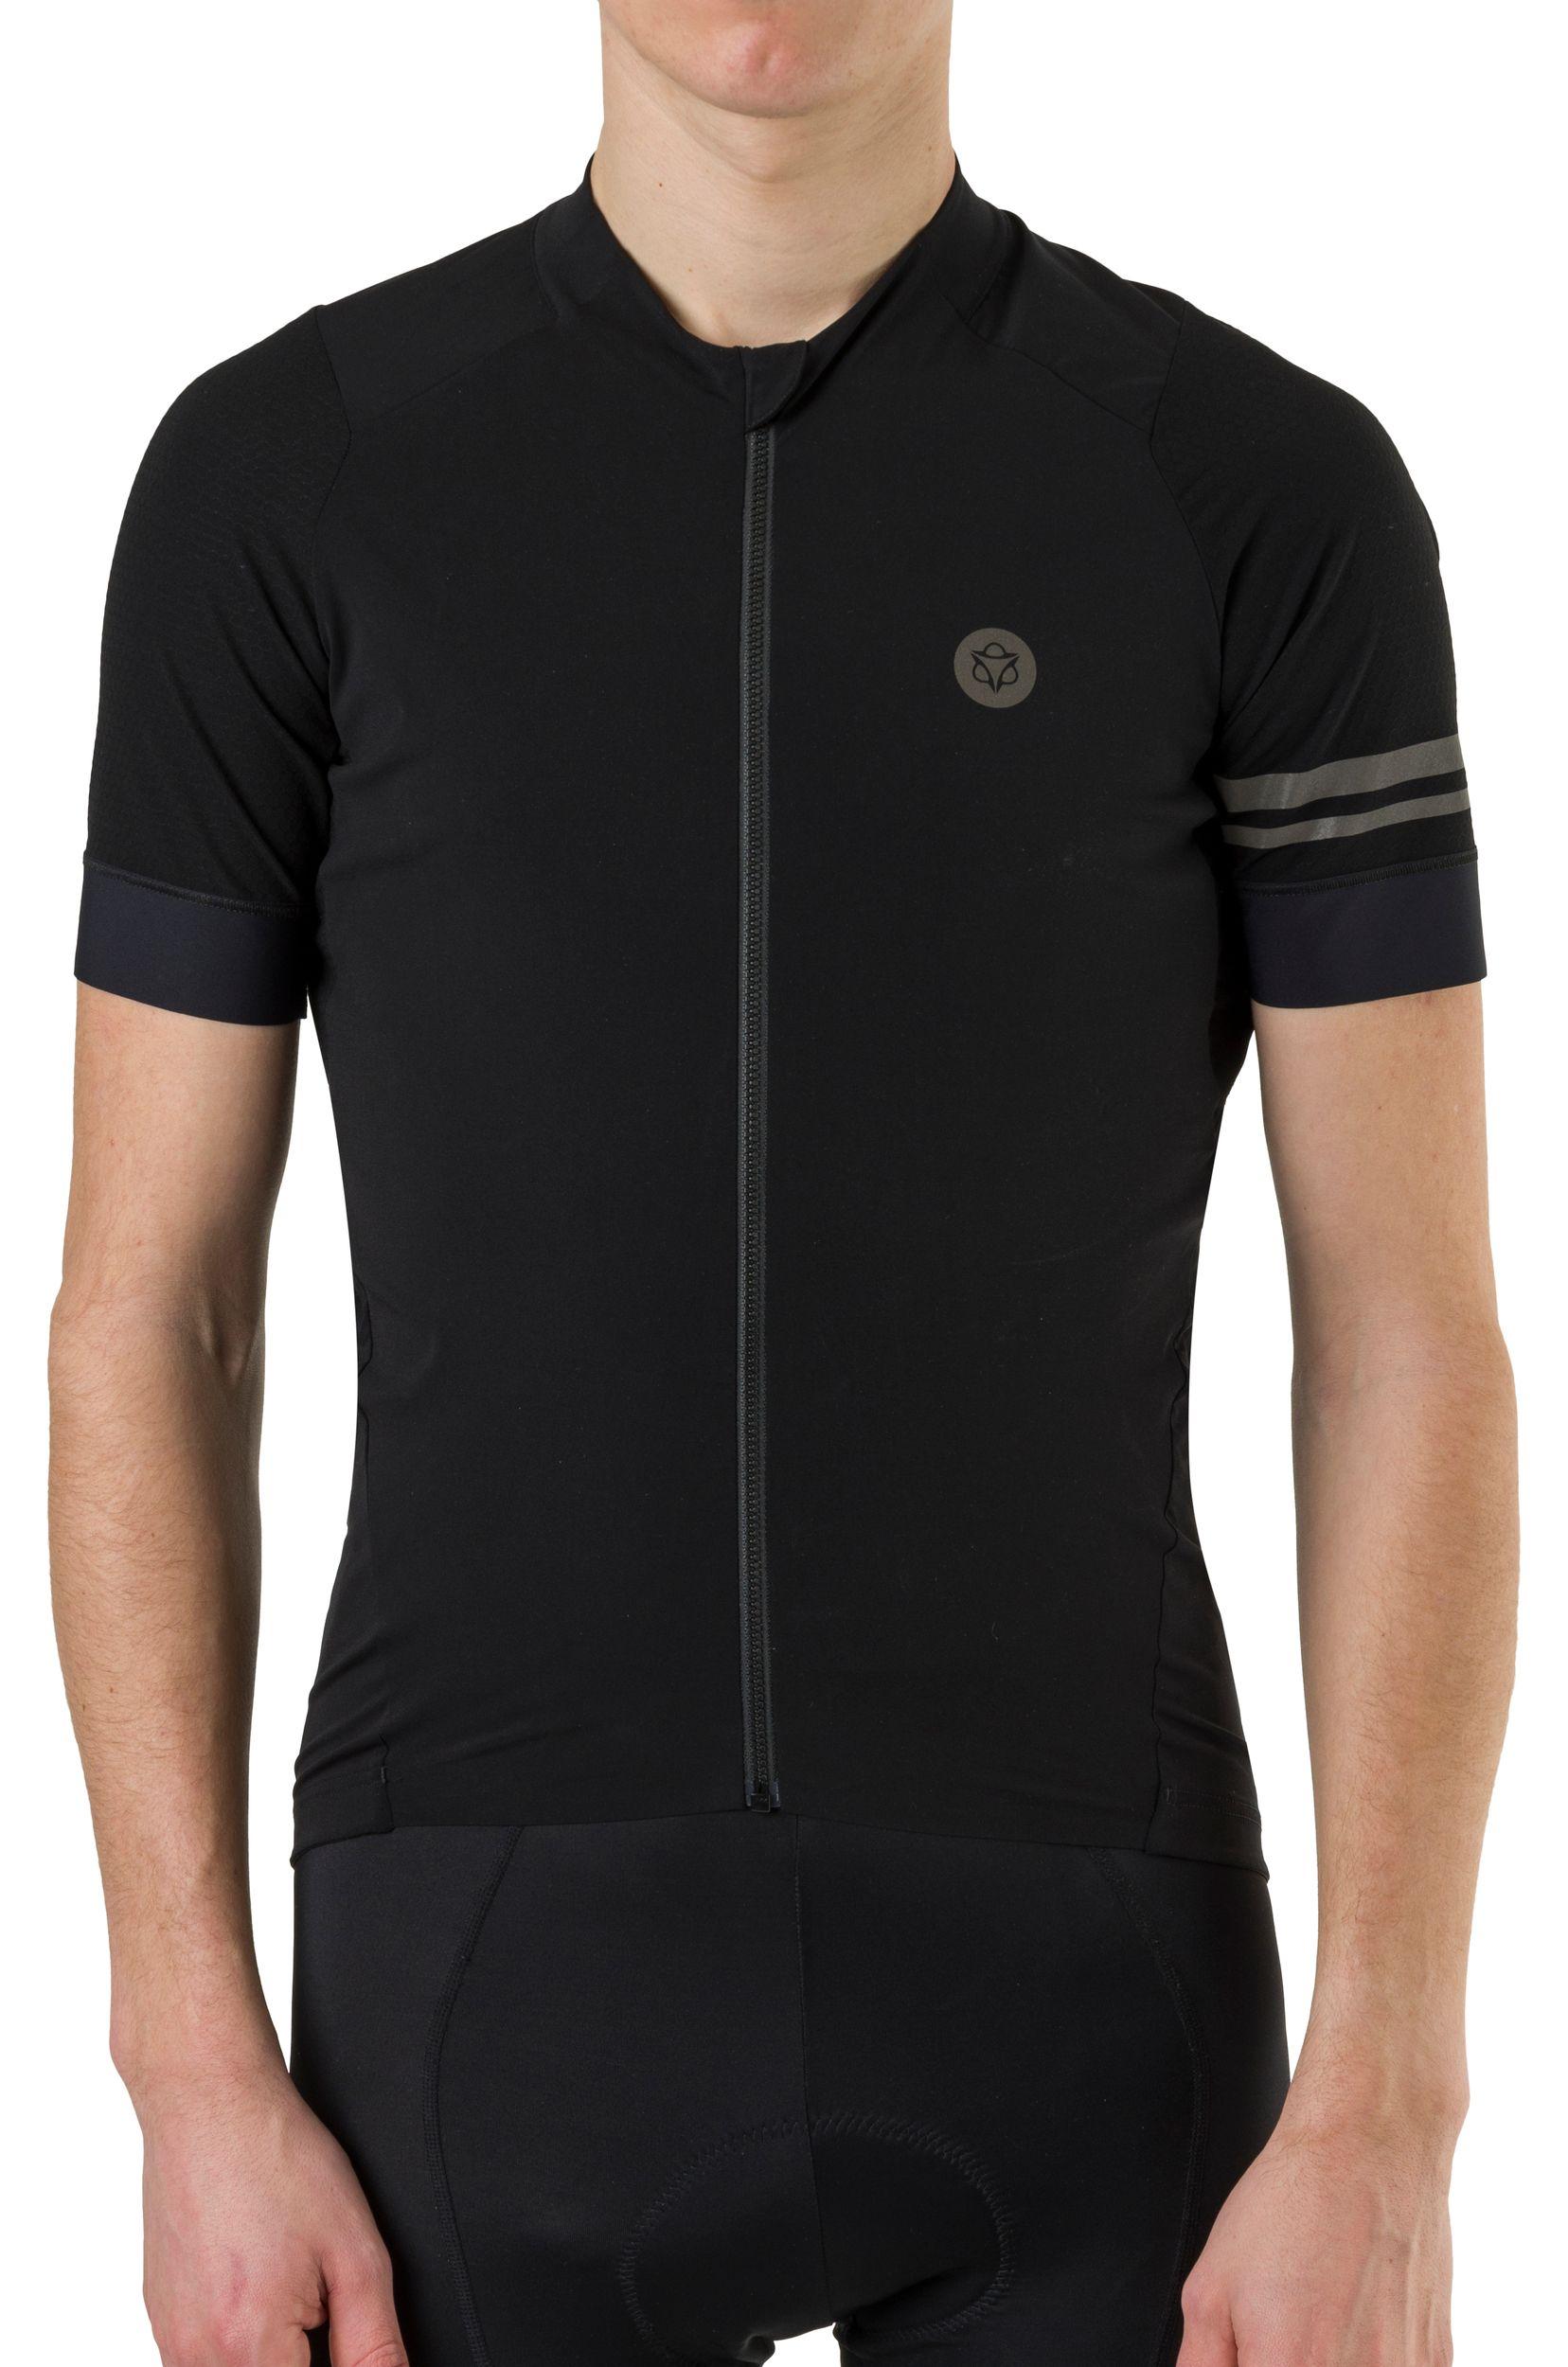 Woven Fietsshirt Premium Heren fit example